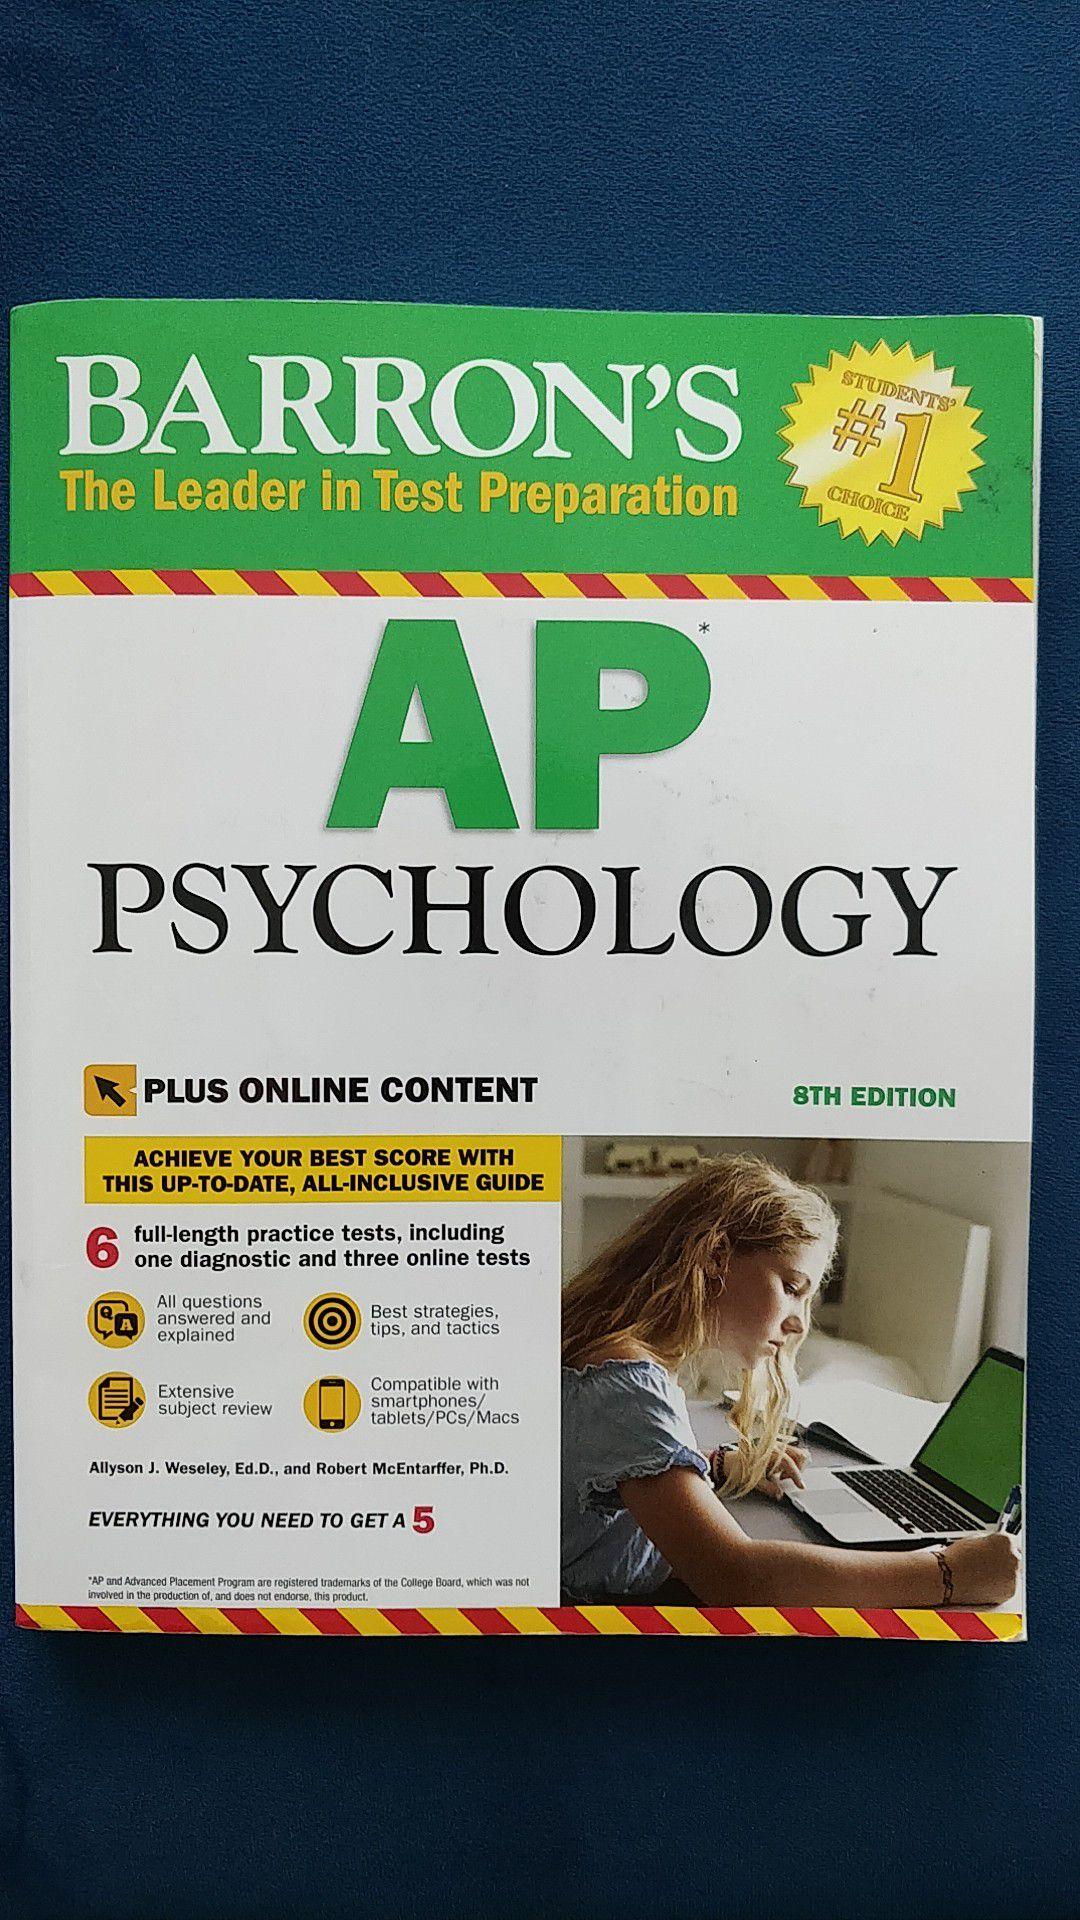 Barron's AP Psychology Review